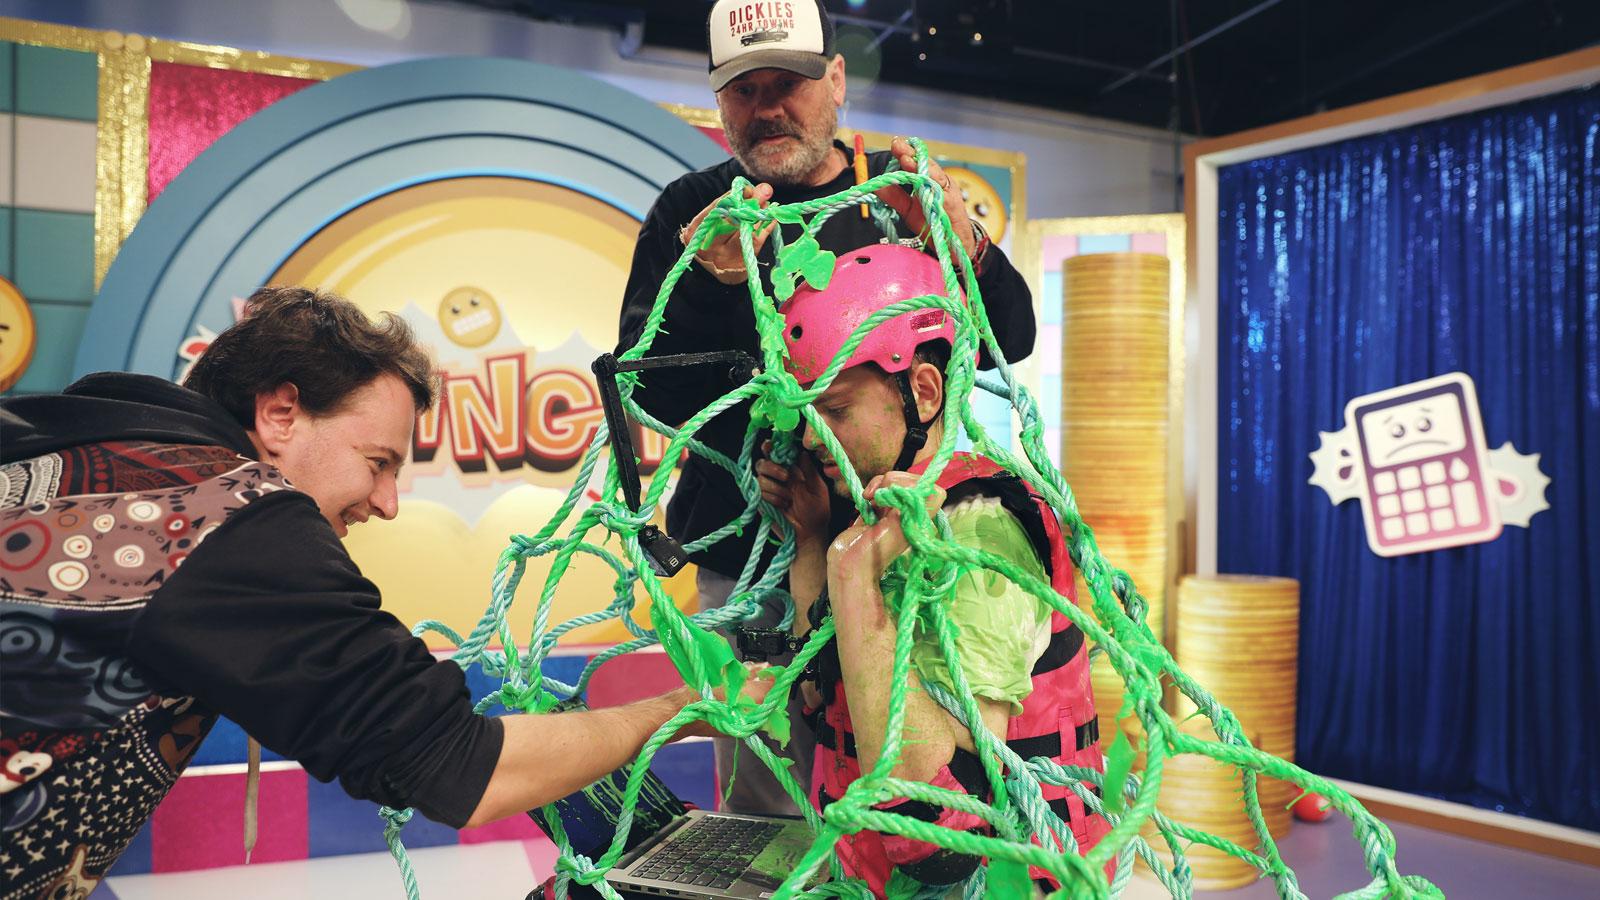 On set at the H&R Block shoot. A man in a pink helmet underneath a green net.